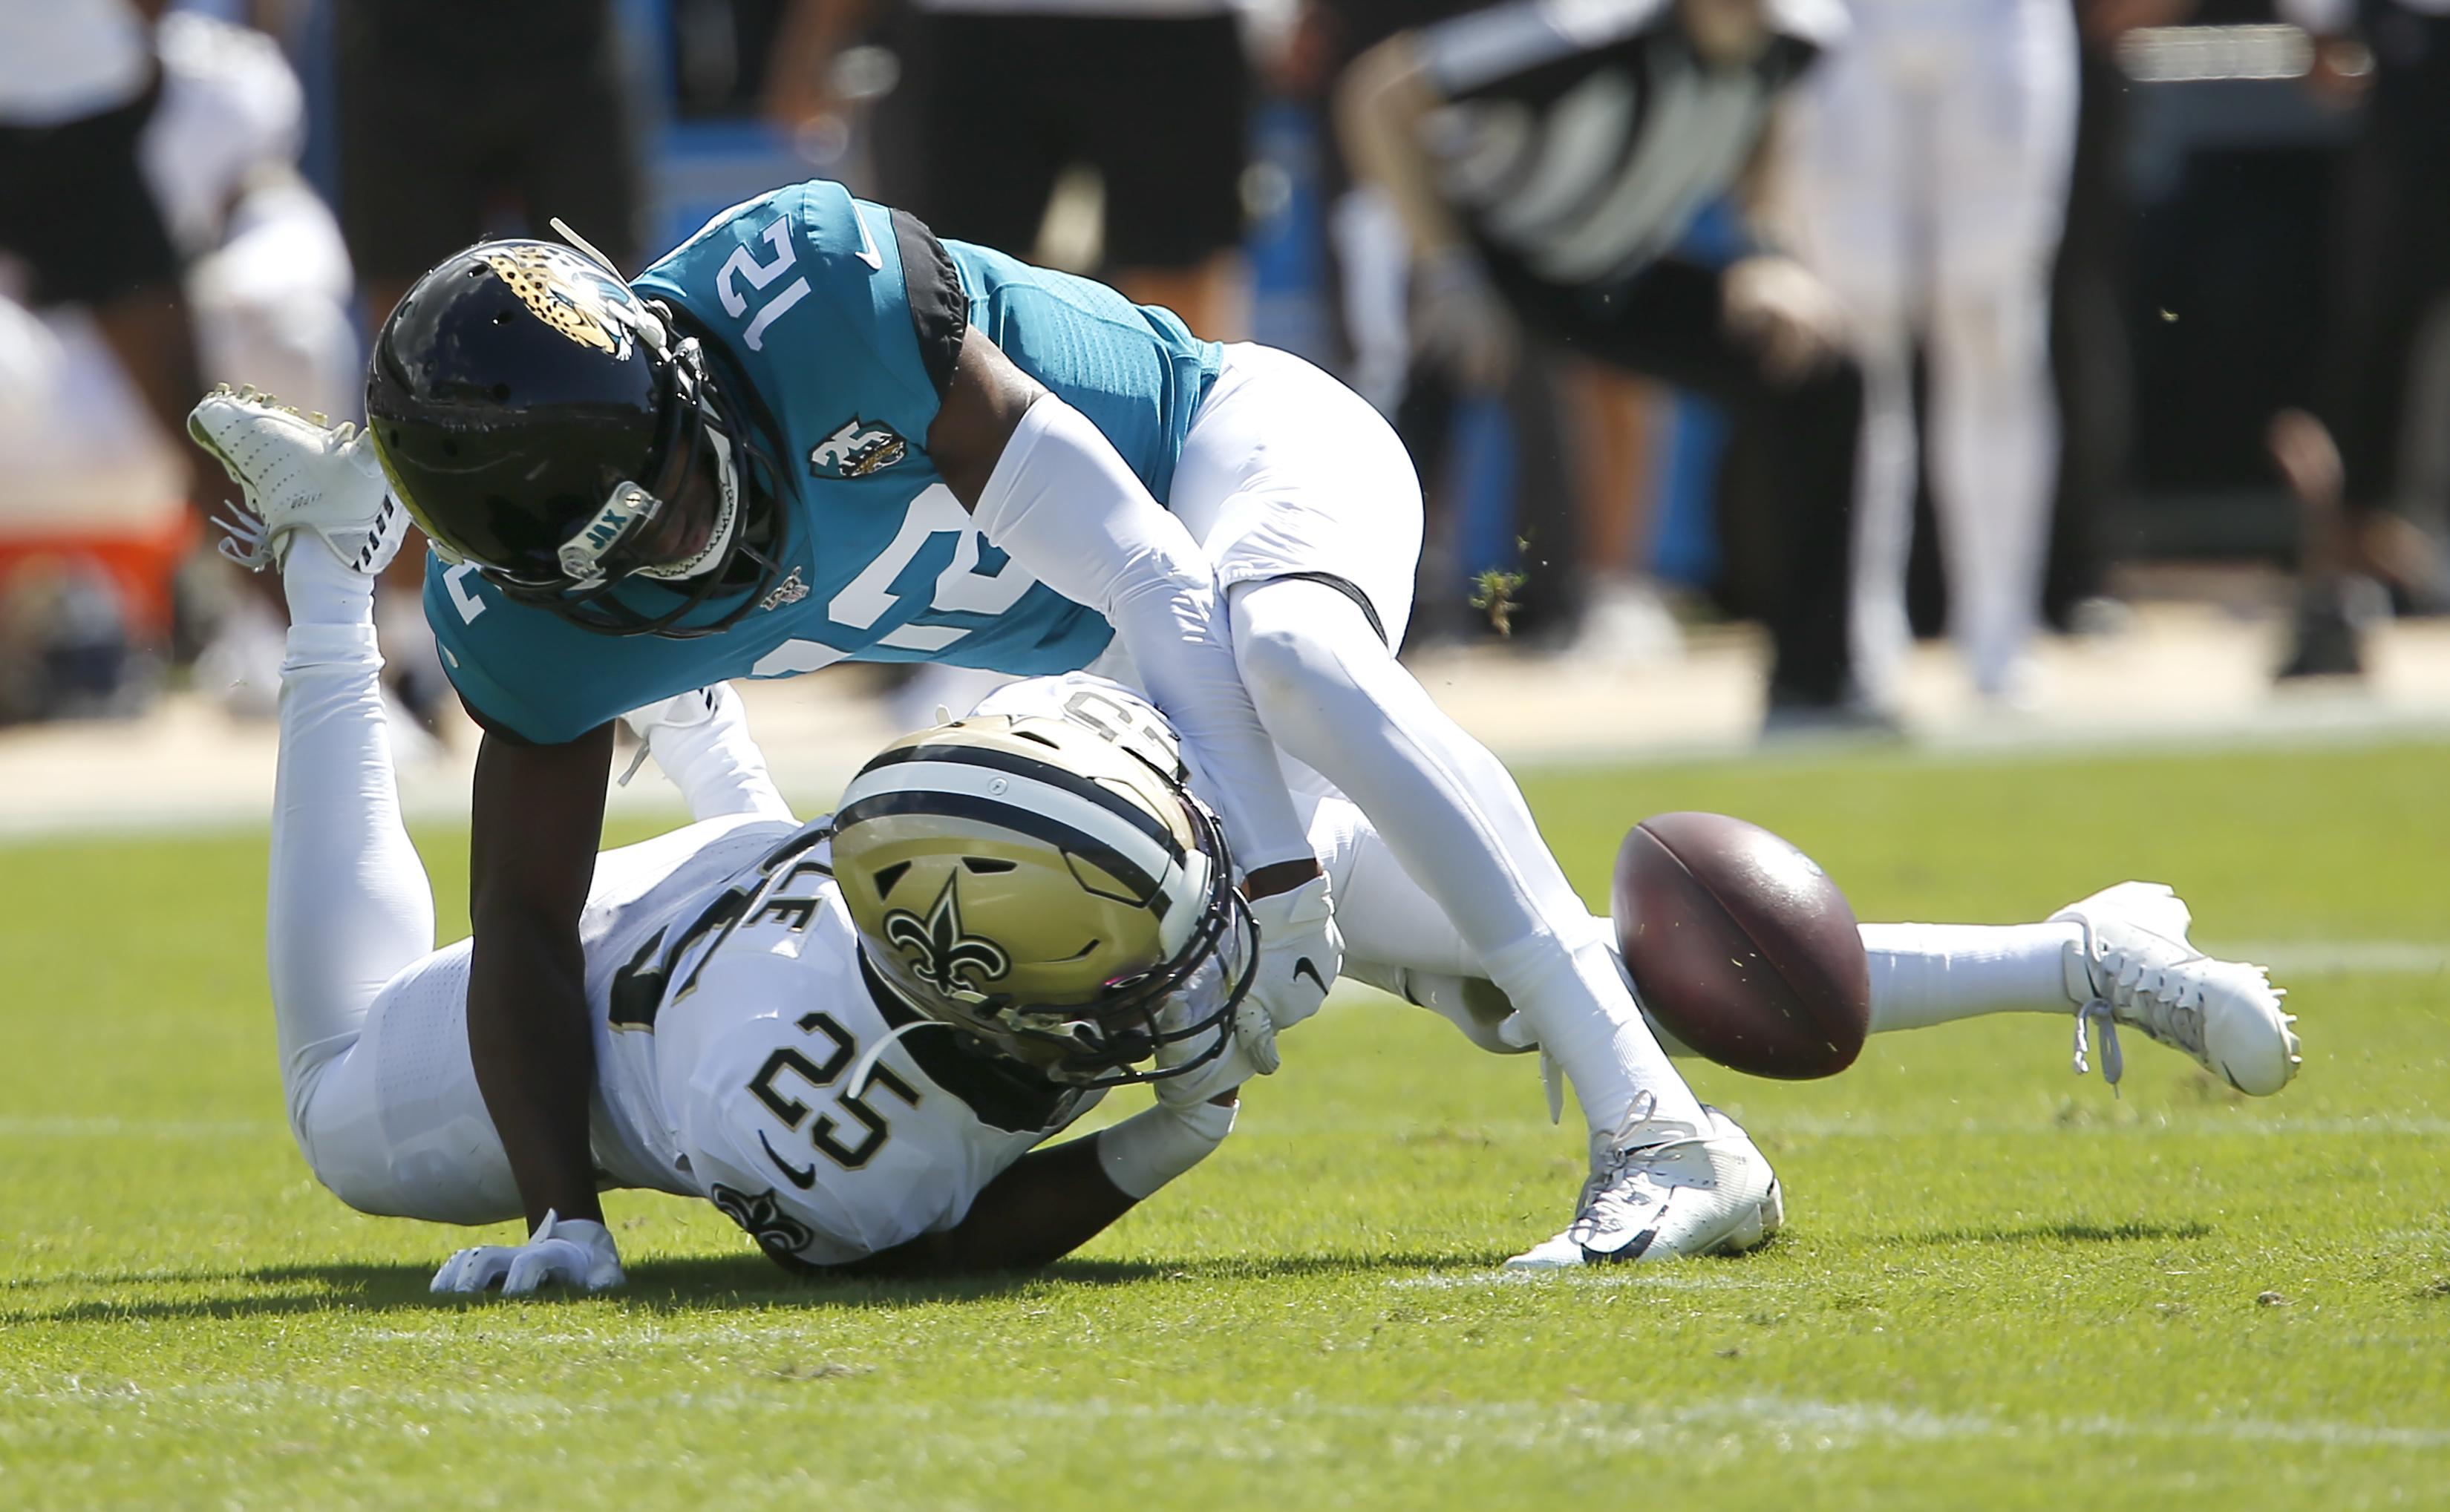 NFL: New Orleans Saints at Jacksonville Jaguars